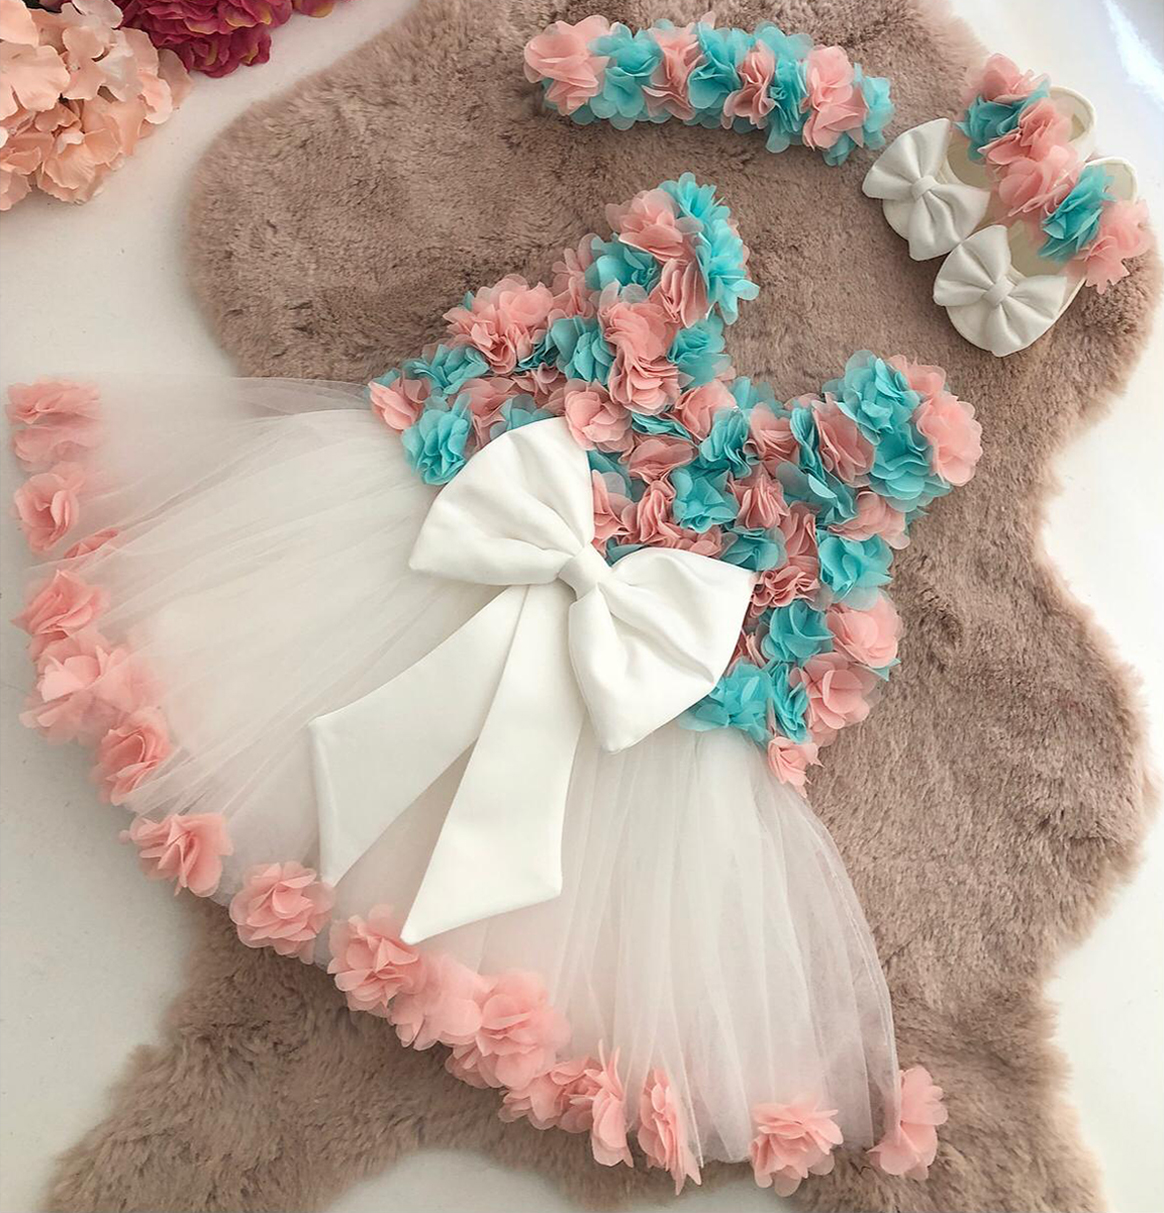 kavunici-turkuaz-kiz-bebek-elbise